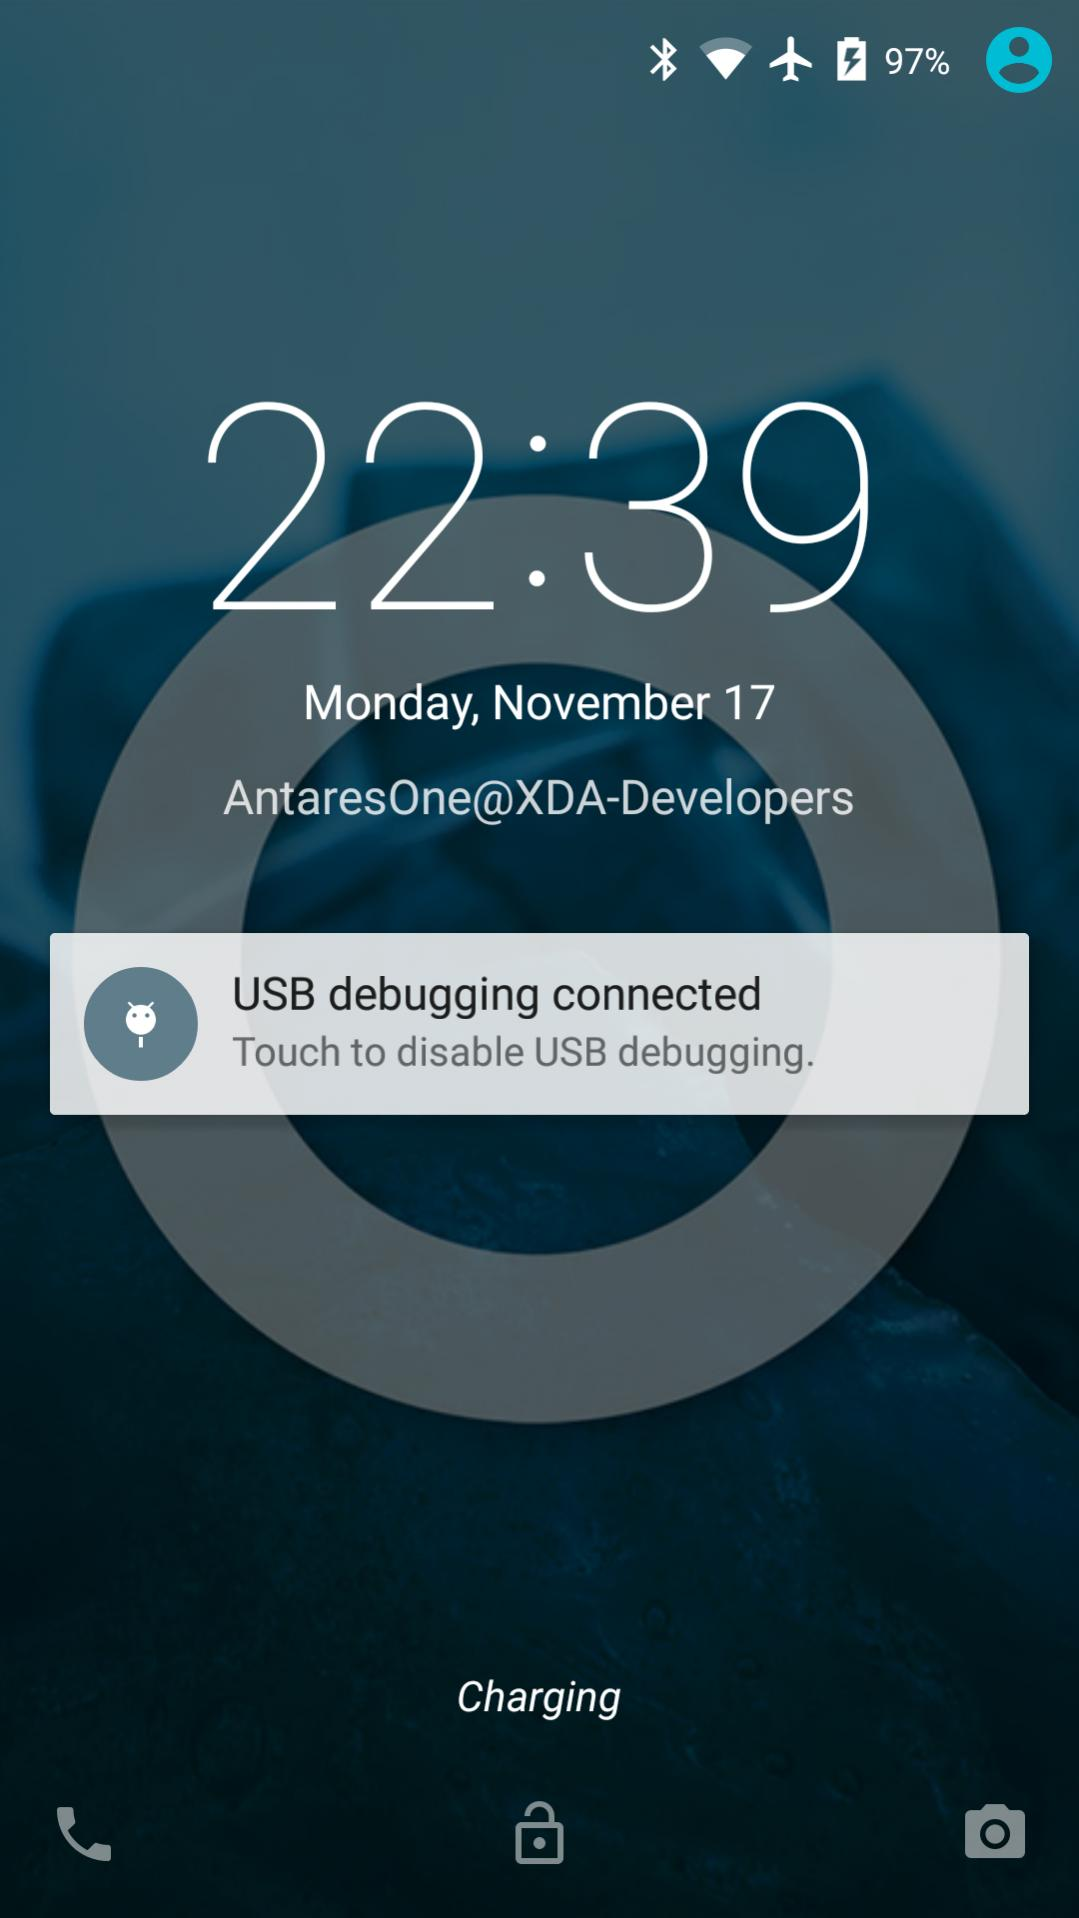 Samsung-Galaxy-S4-CyanogenMod-12-Android-5.0-Lollipop-5